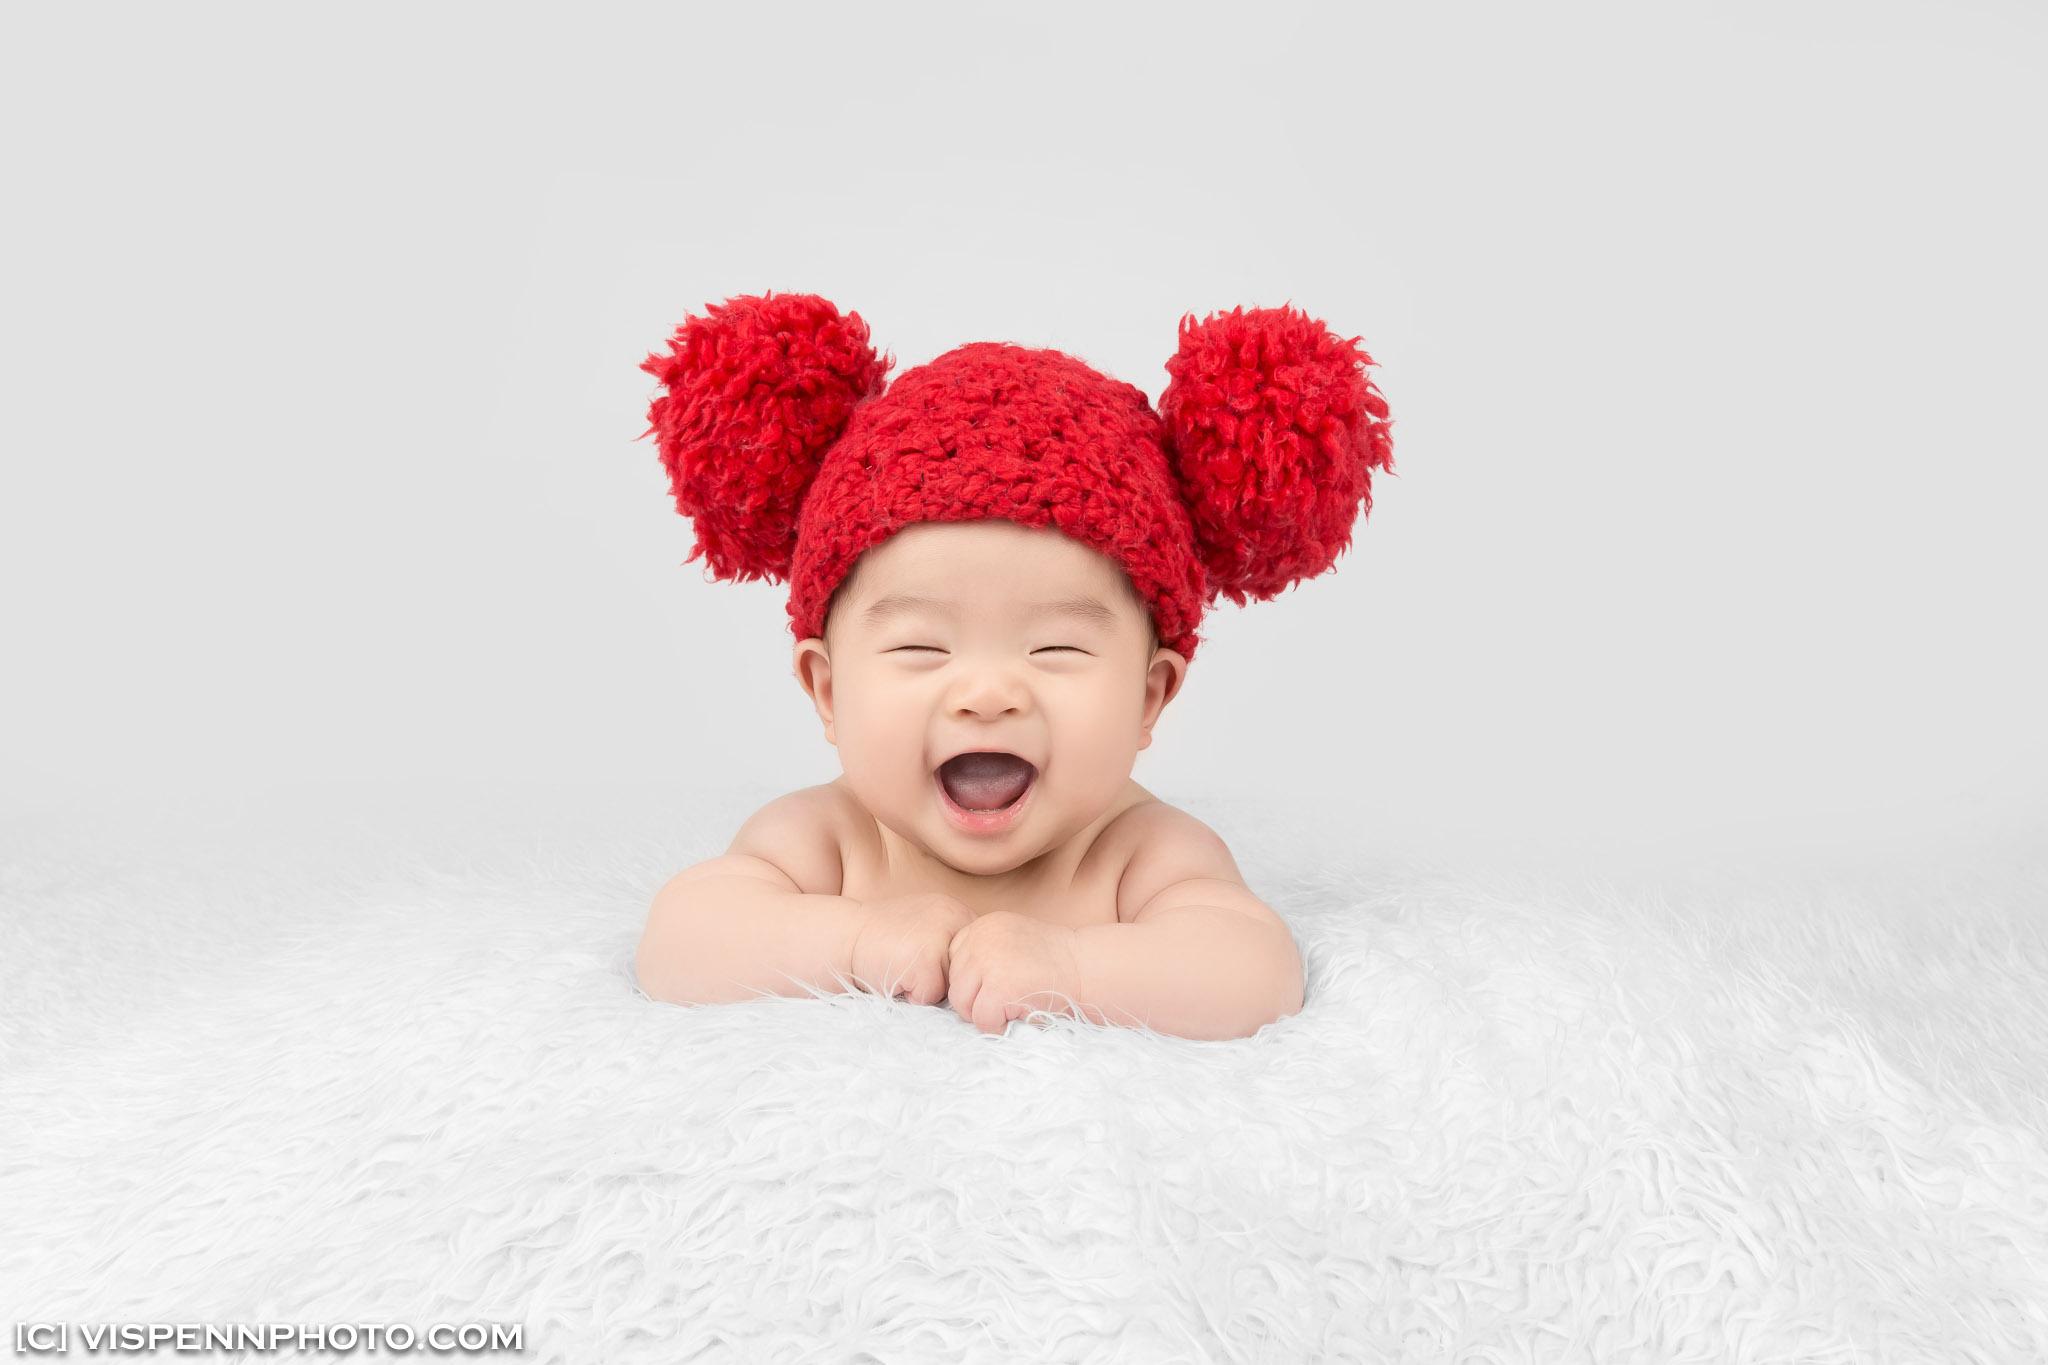 Melbourne Newborn Baby Family Photo BaoBao VISPENN 墨尔本 儿童 宝宝 百天照 满月照 孕妇照 全家福 100DAYS VISPENN SallyPU 1162